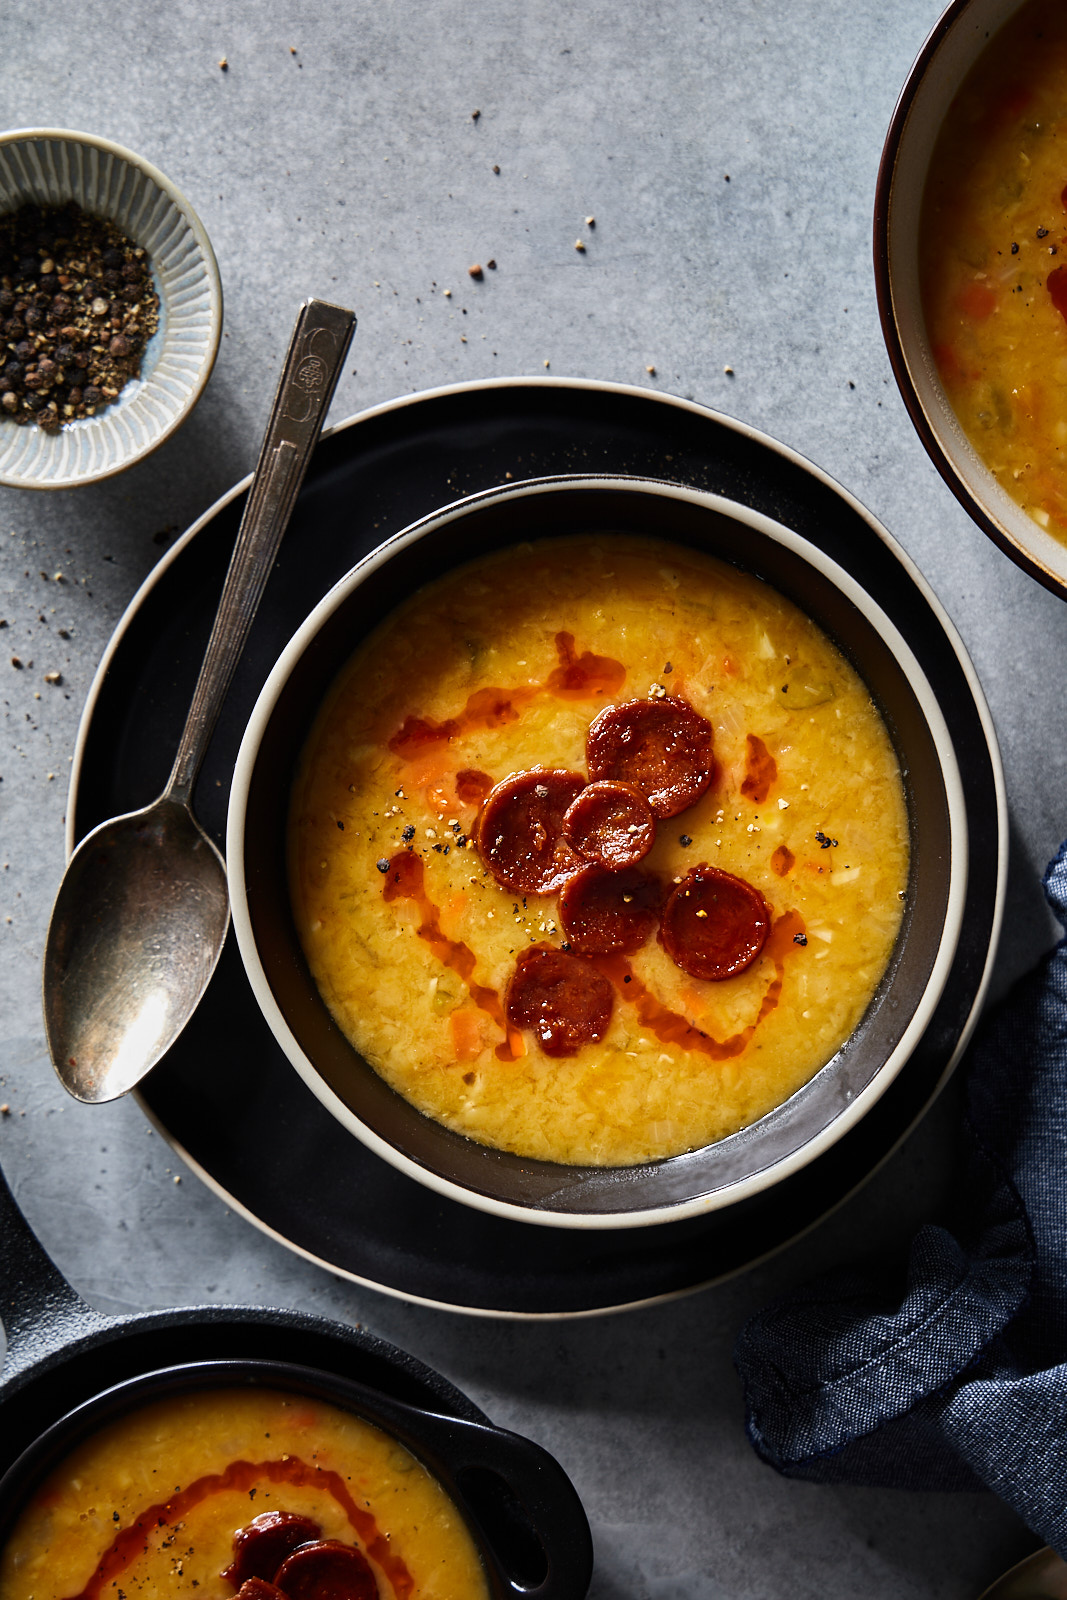 Smokey Red Lentil and Chorizo Soup